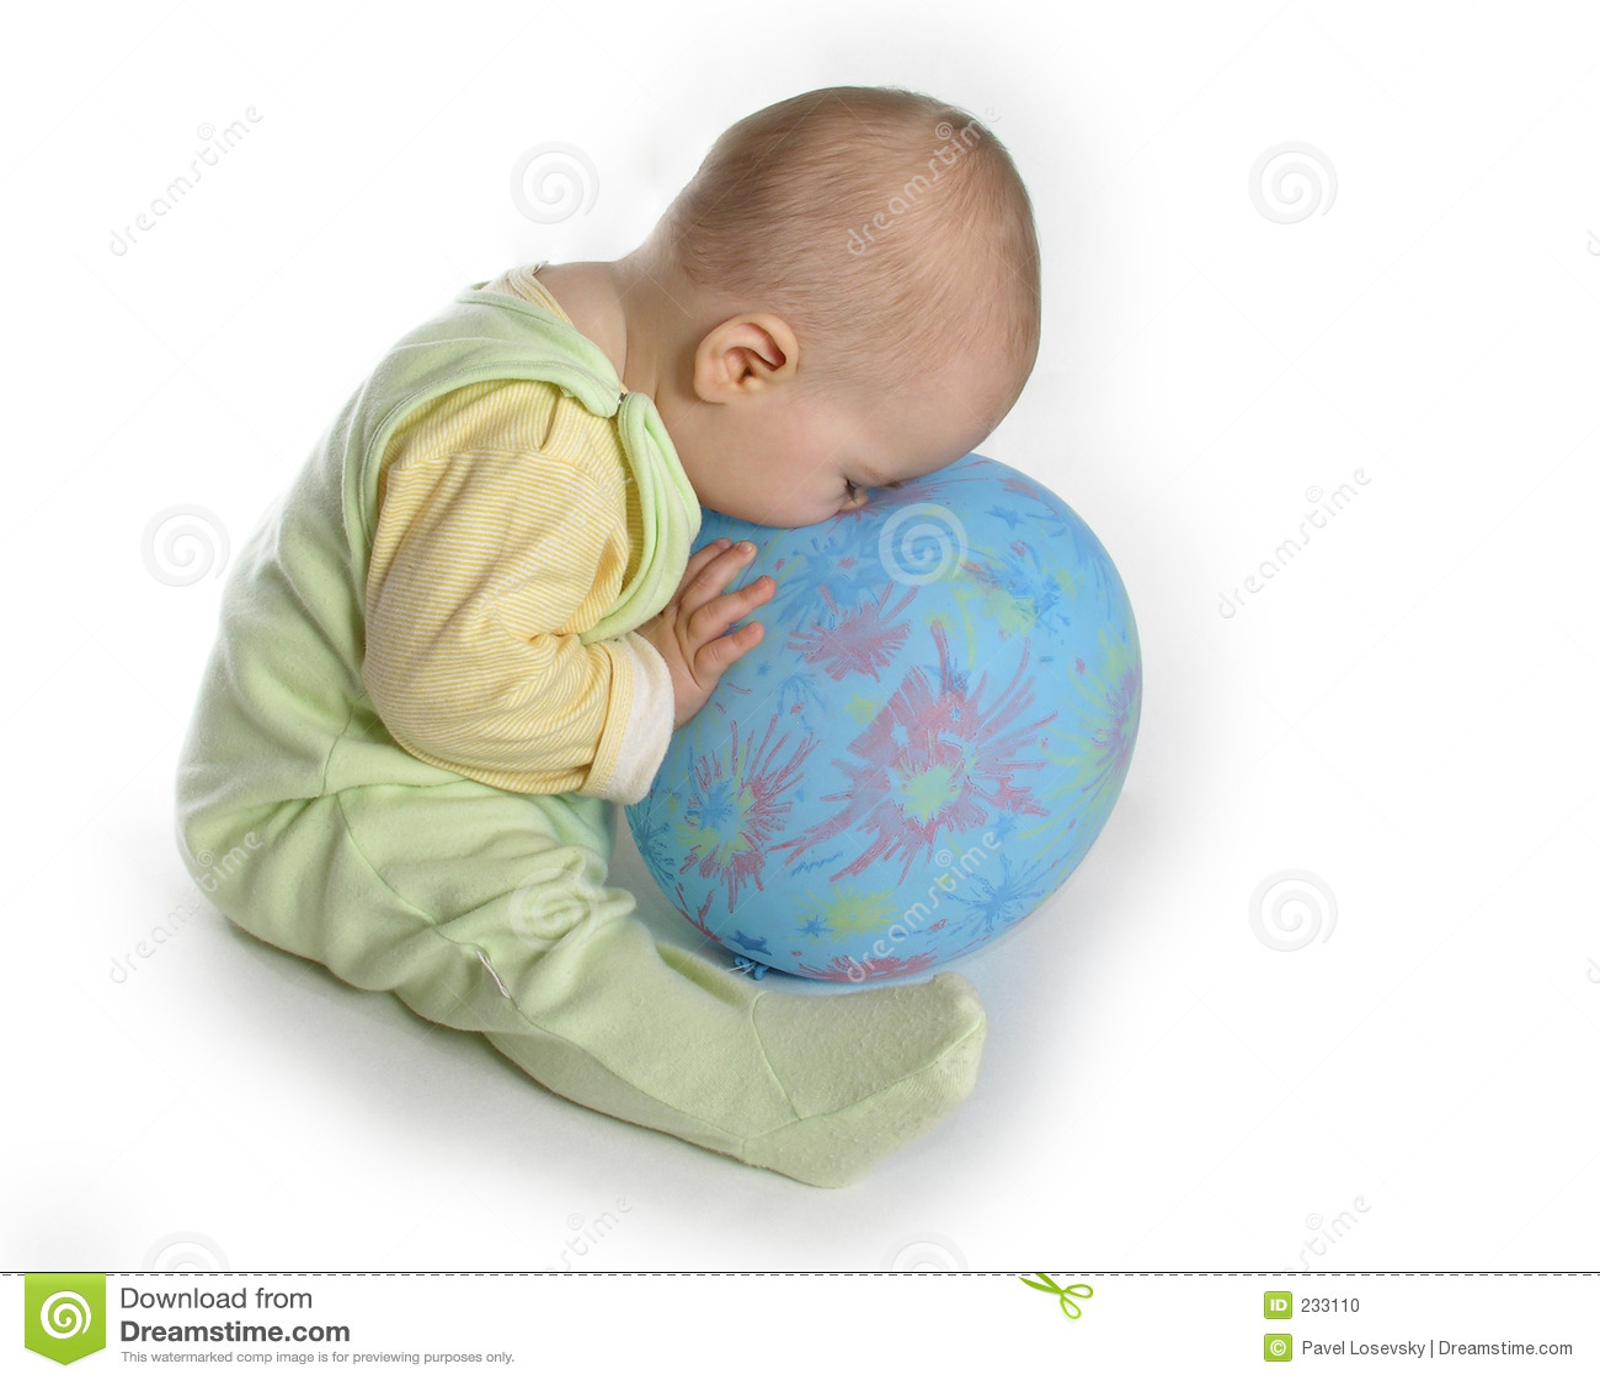 нос воздушного шара младенца, котор нужно коснуться